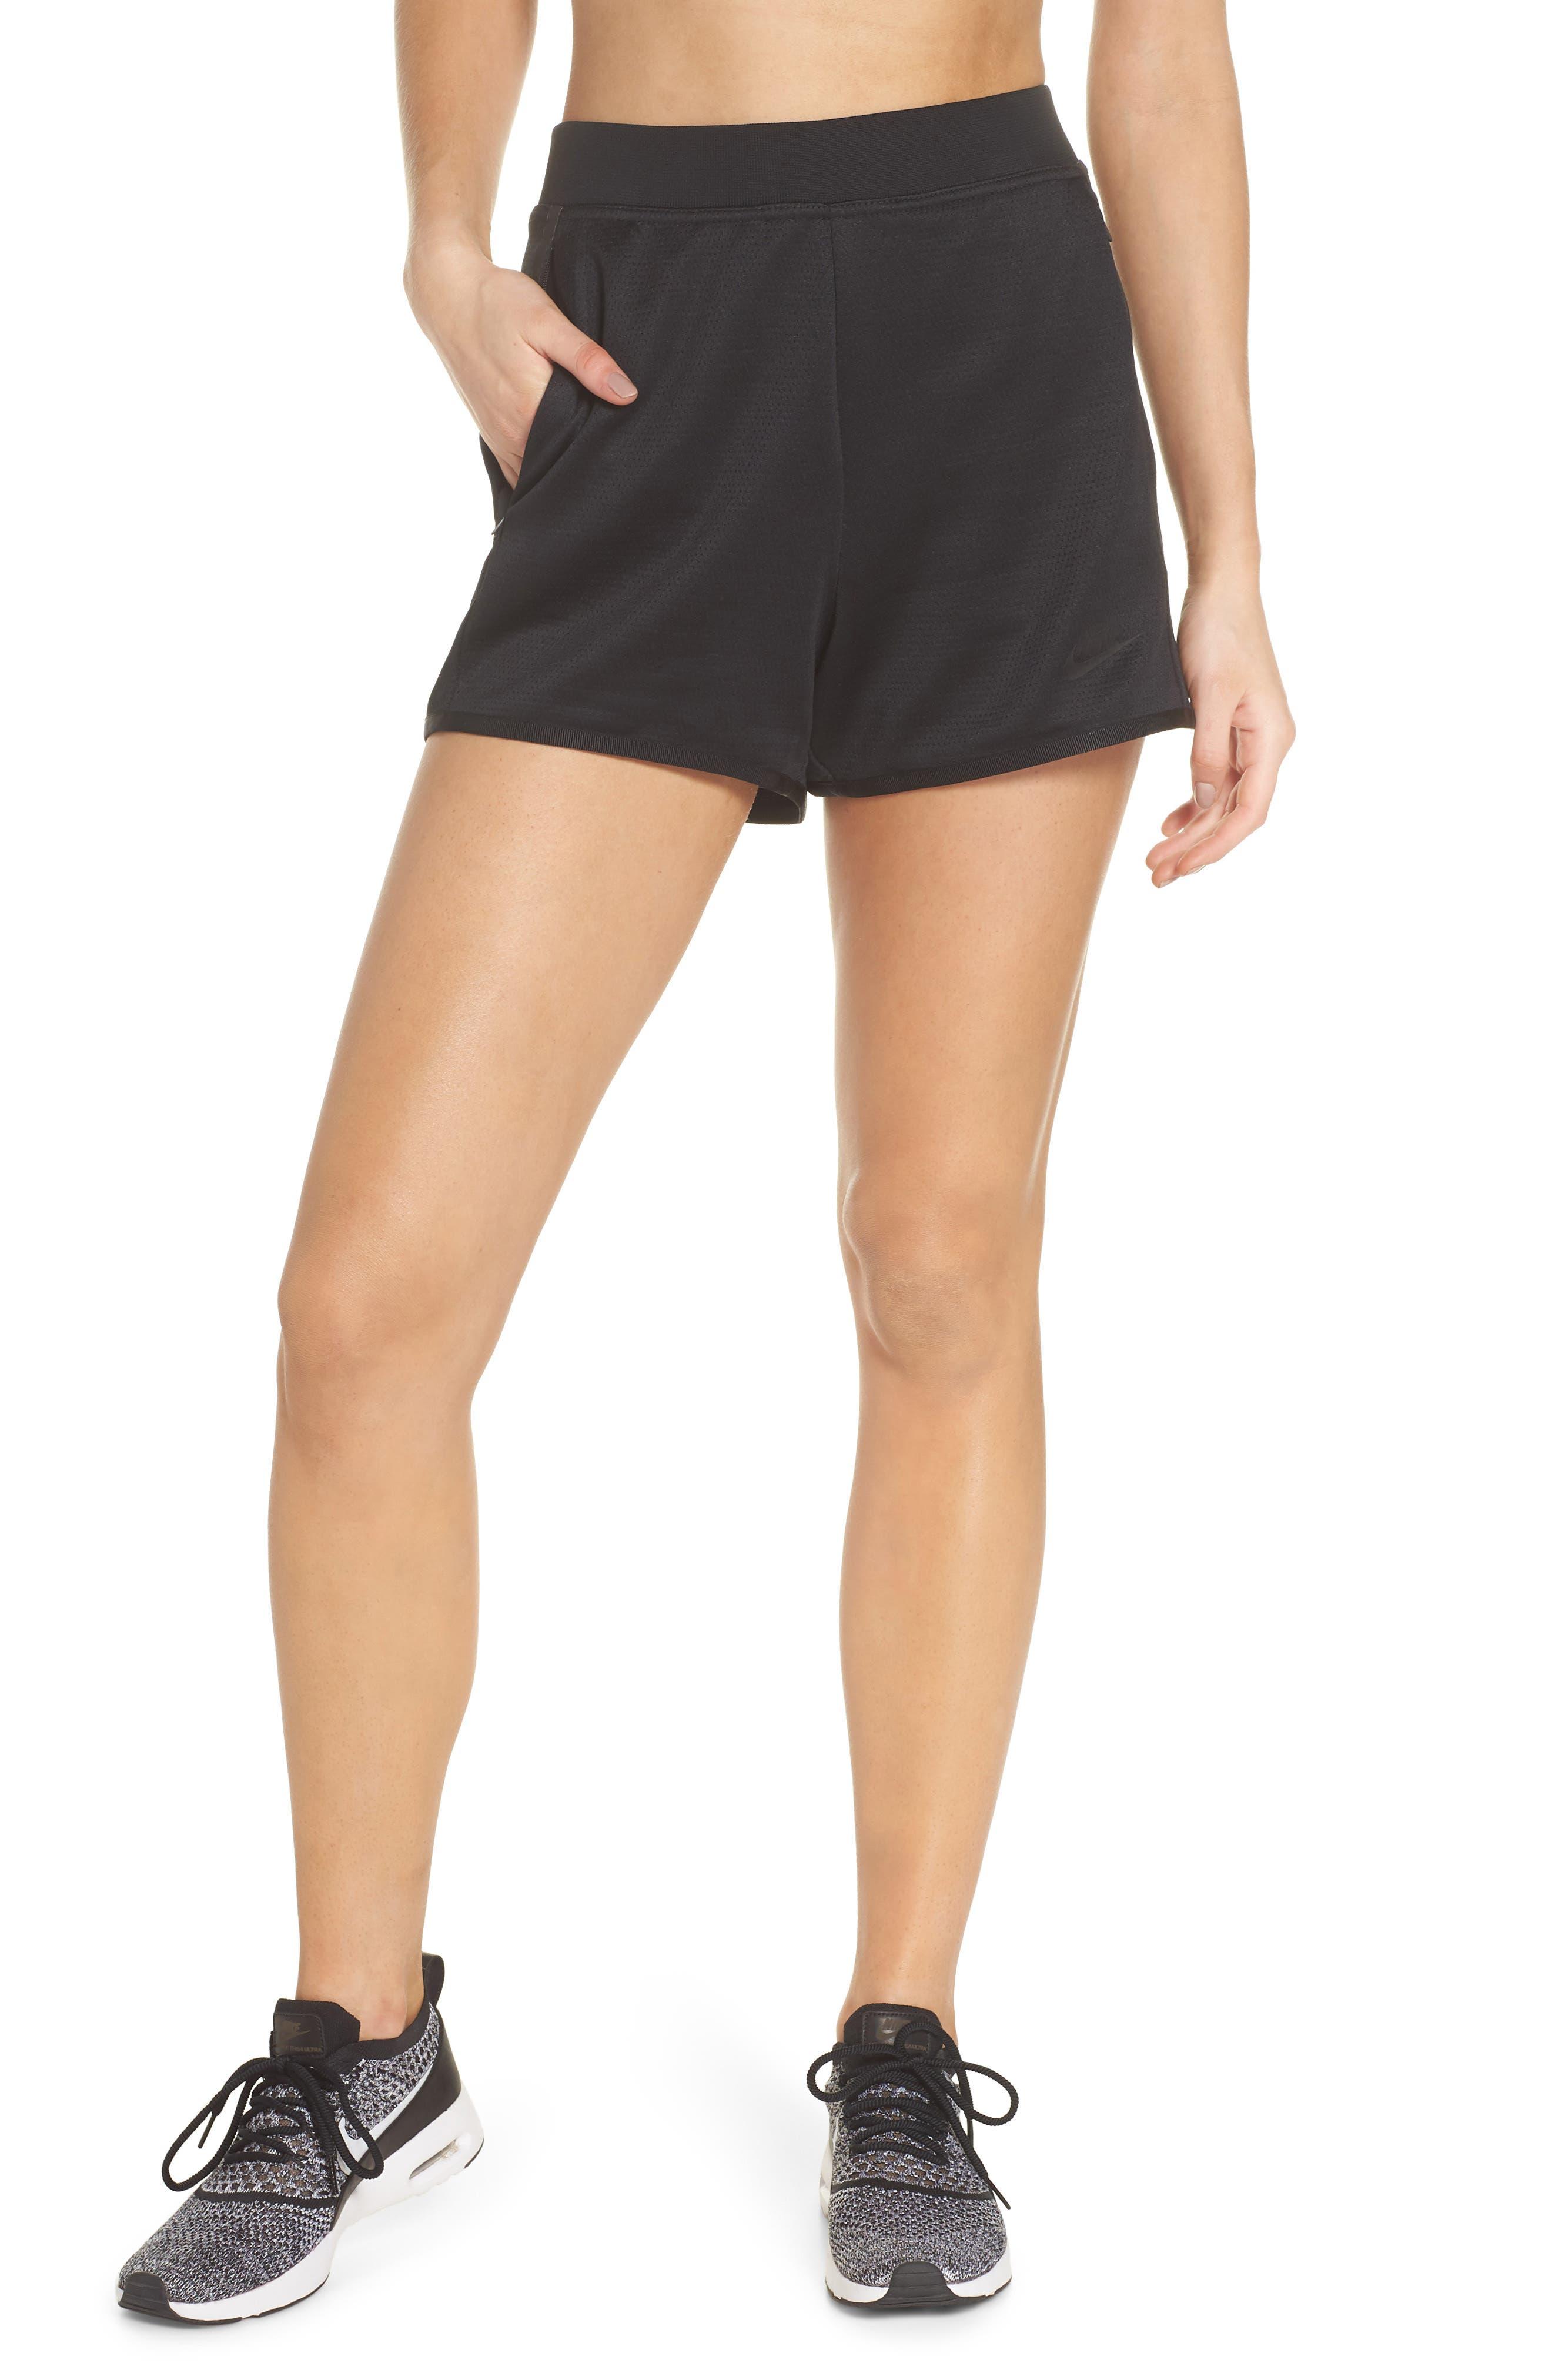 Sportswear Tech Fleece Short,                             Main thumbnail 1, color,                             Black/ Black